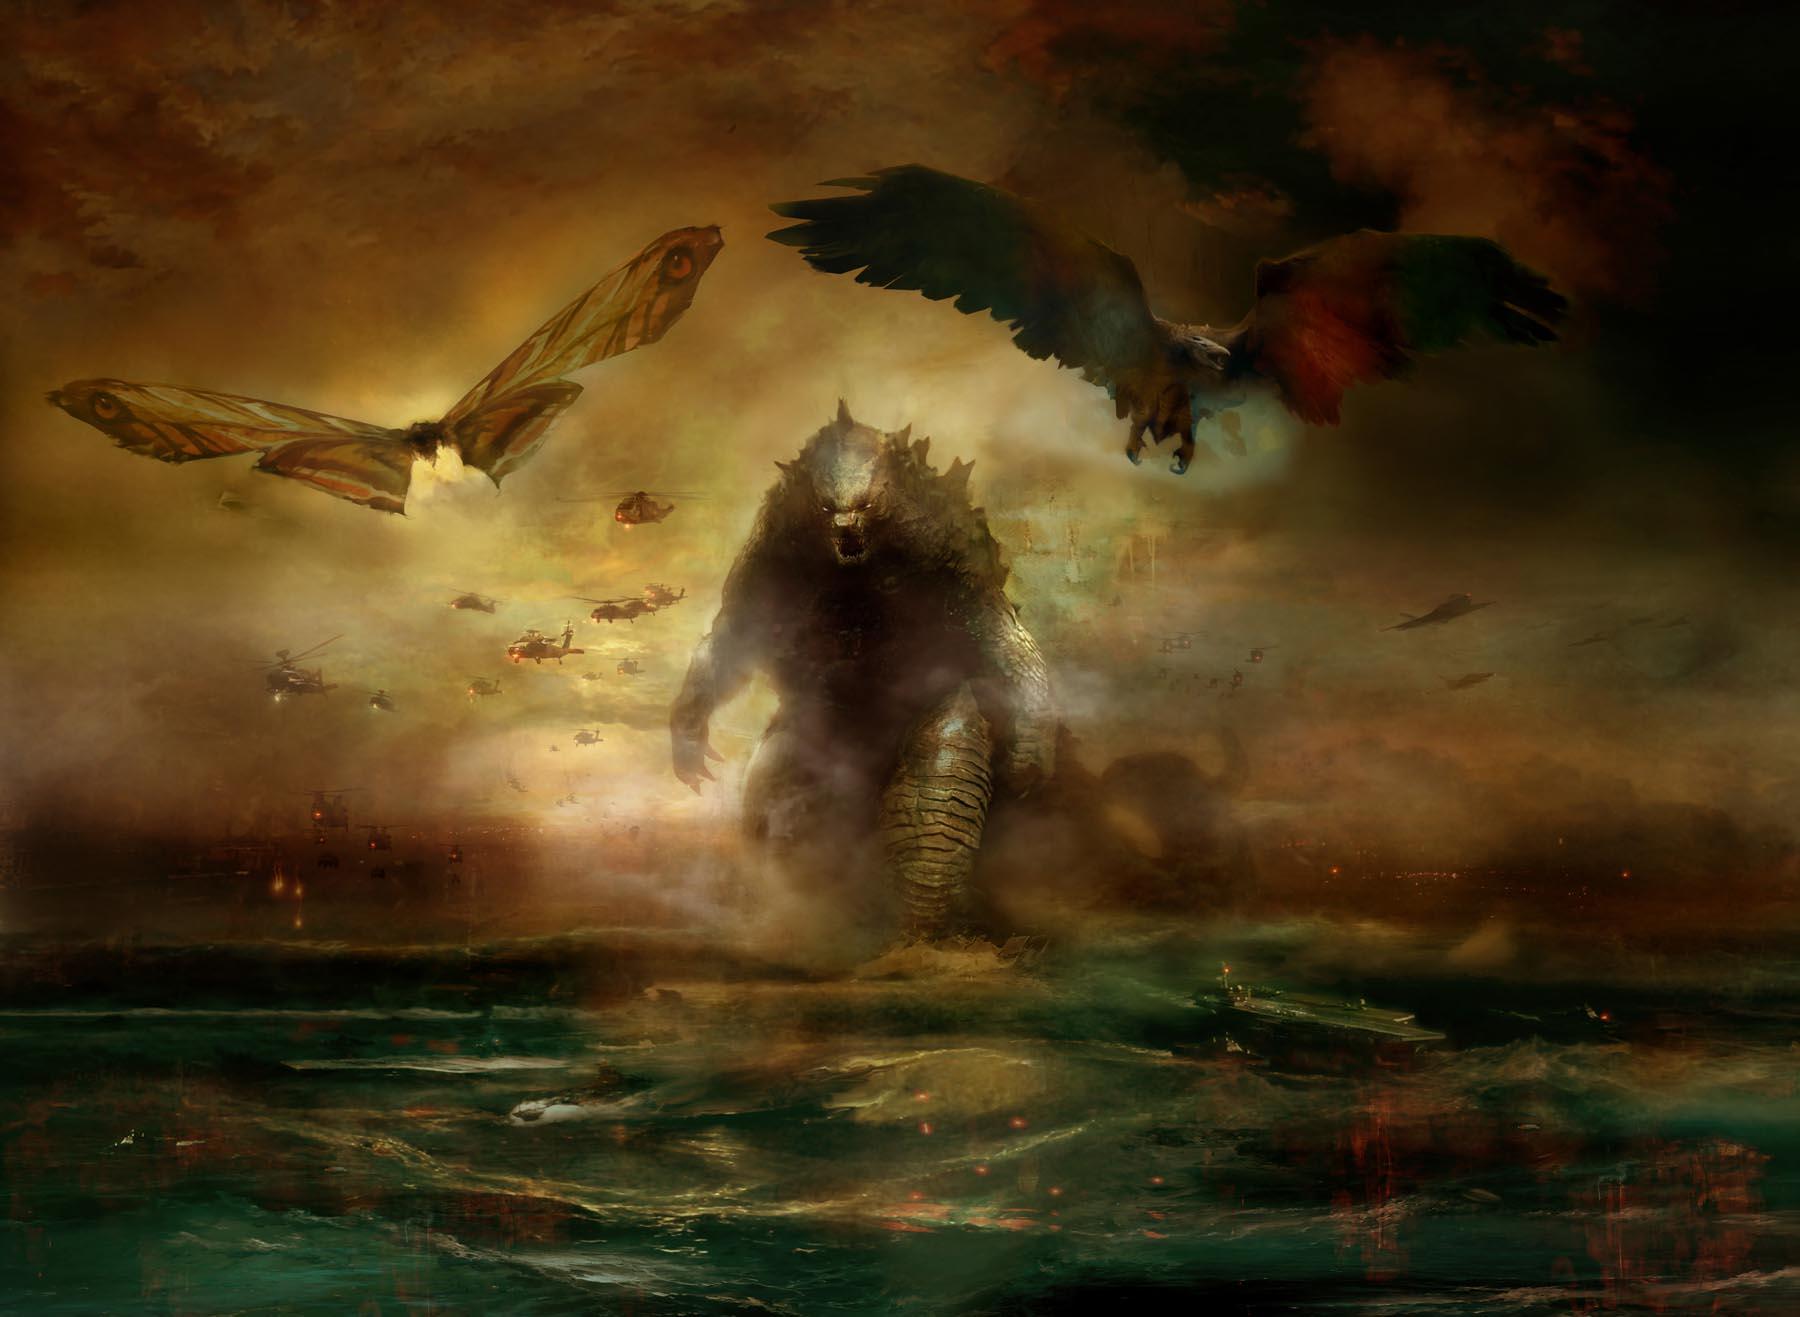 Wallpaper Godzilla King Of The Monsters Kaiju Creature Rodan